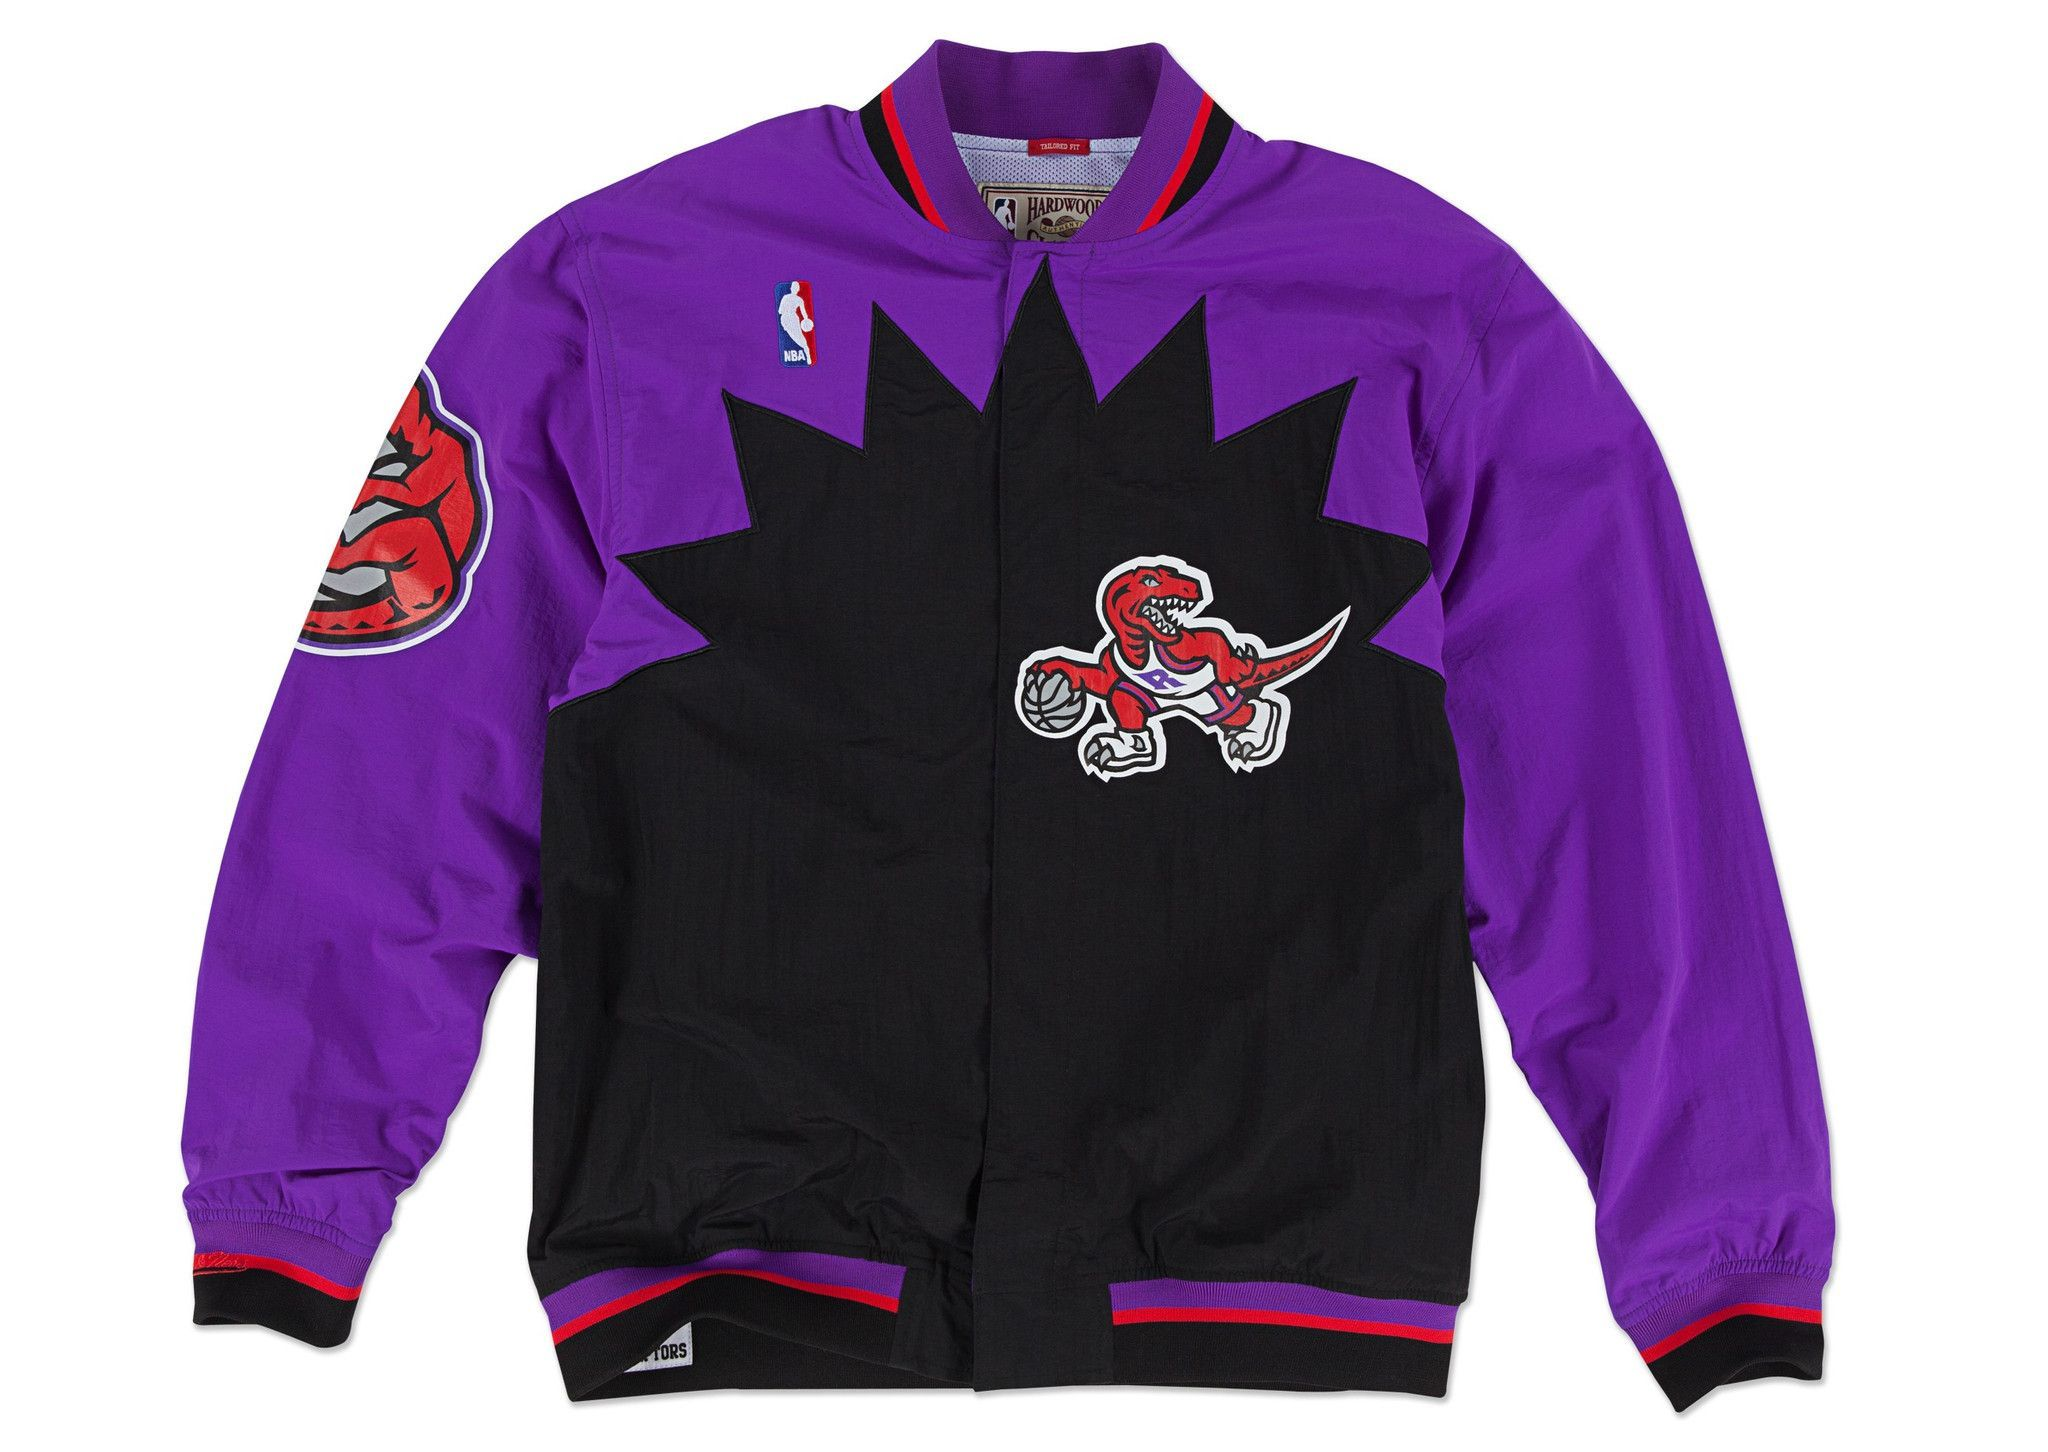 1995-96 Authentic Warm Up Jacket Toronto Raptors  3f03844e5e